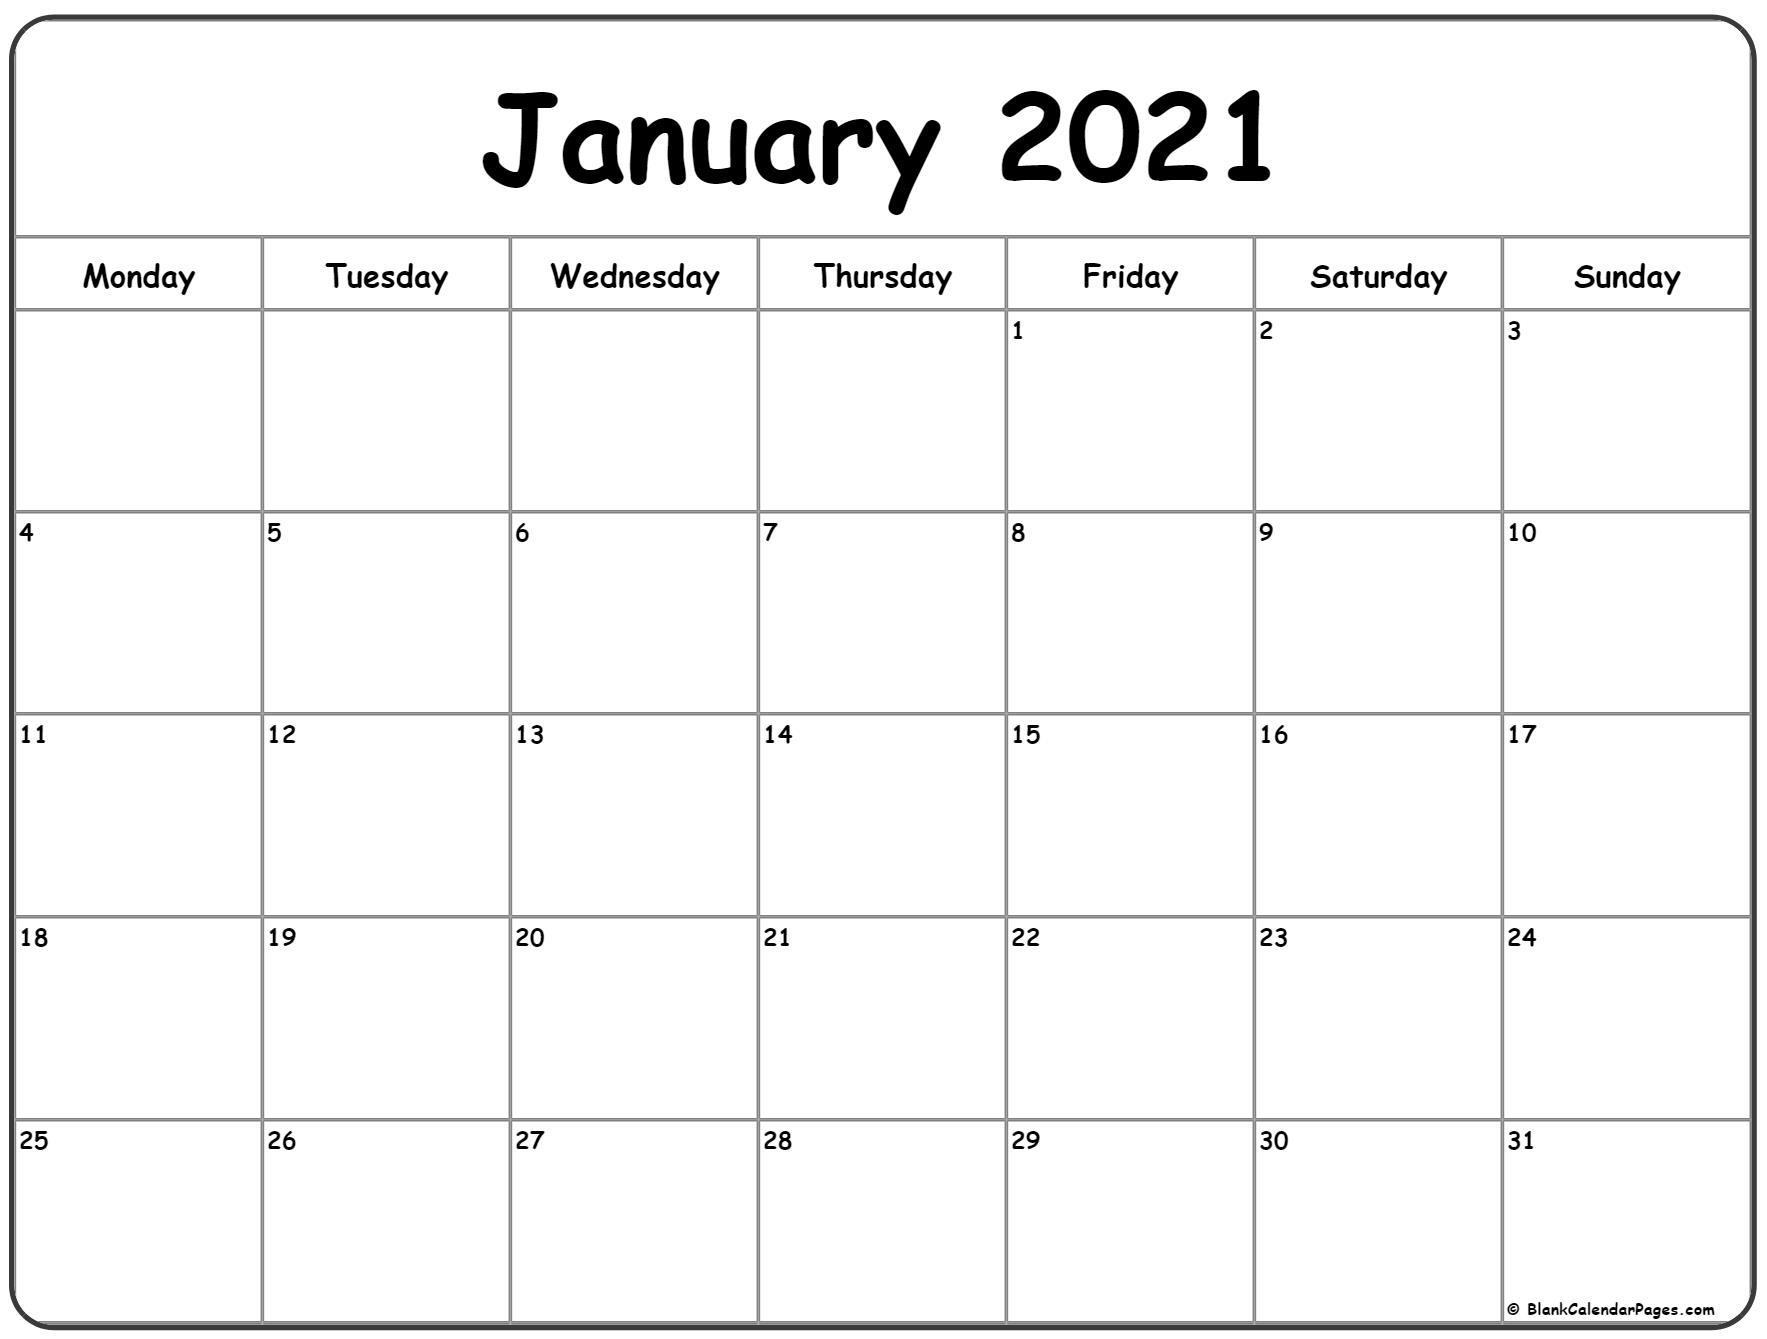 Catch Printable Monday To Sunday Calendar 2021